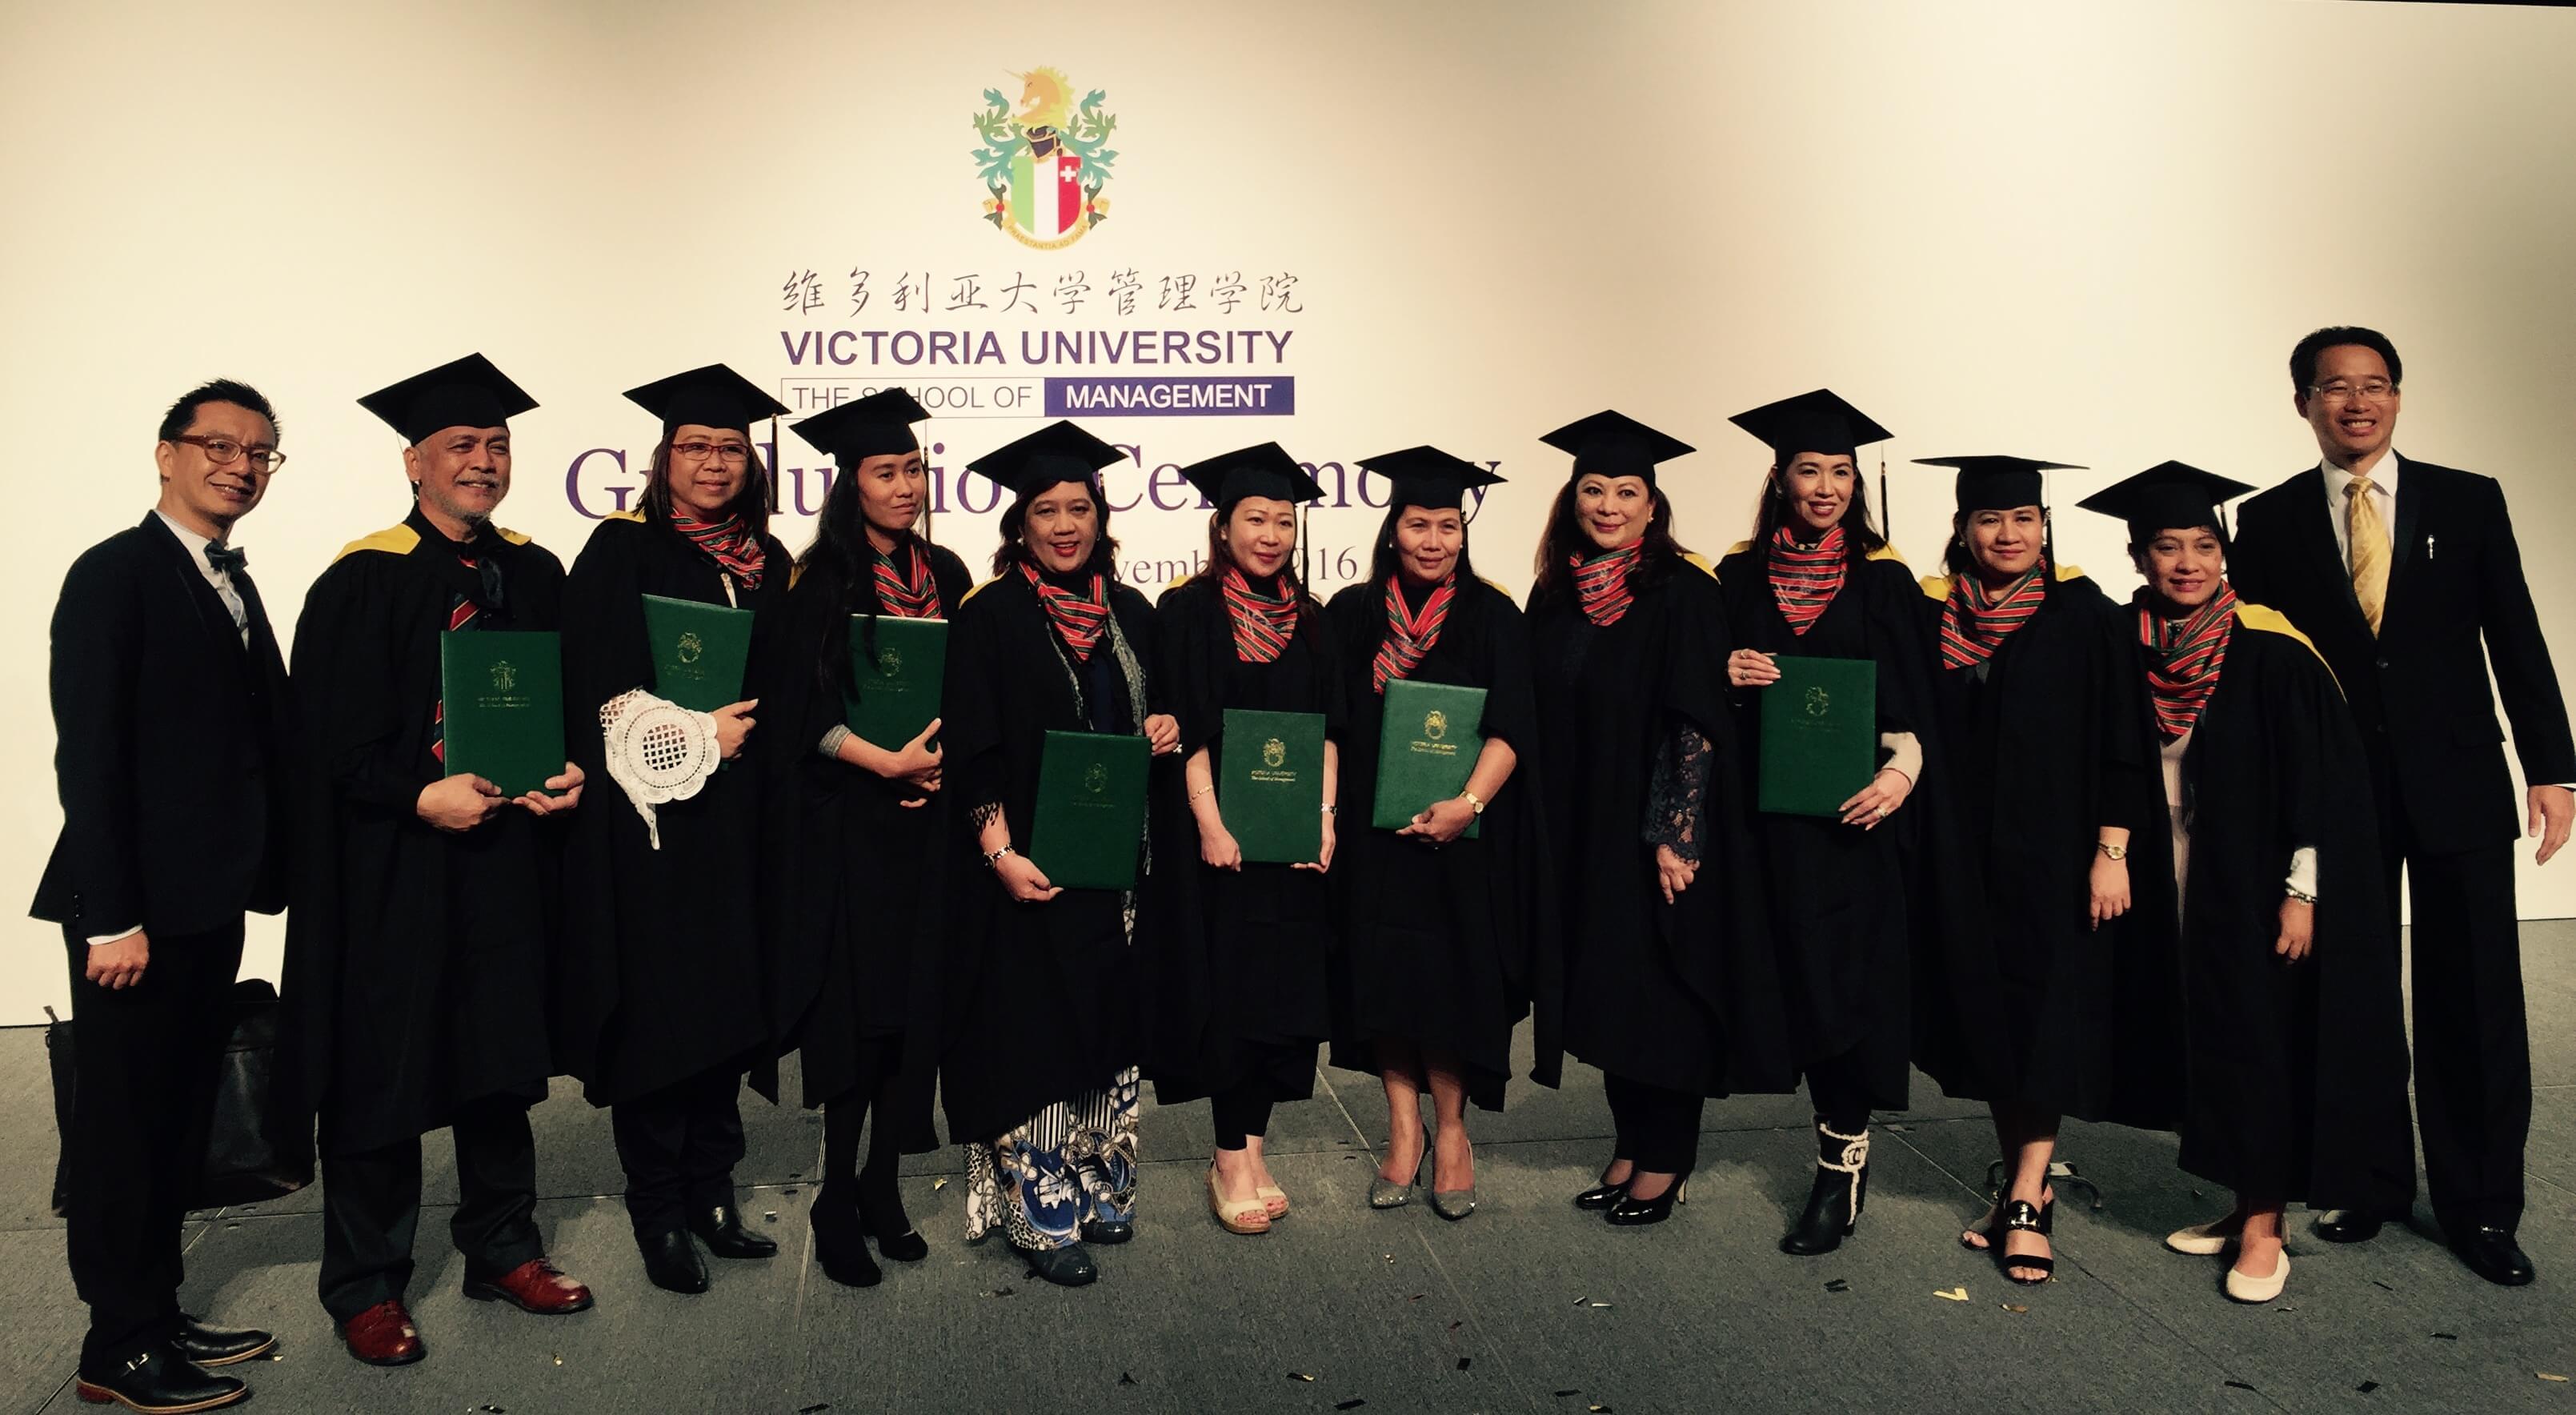 Philippine Cohort of Victoria University MBA Program Graduates in Hong Kong